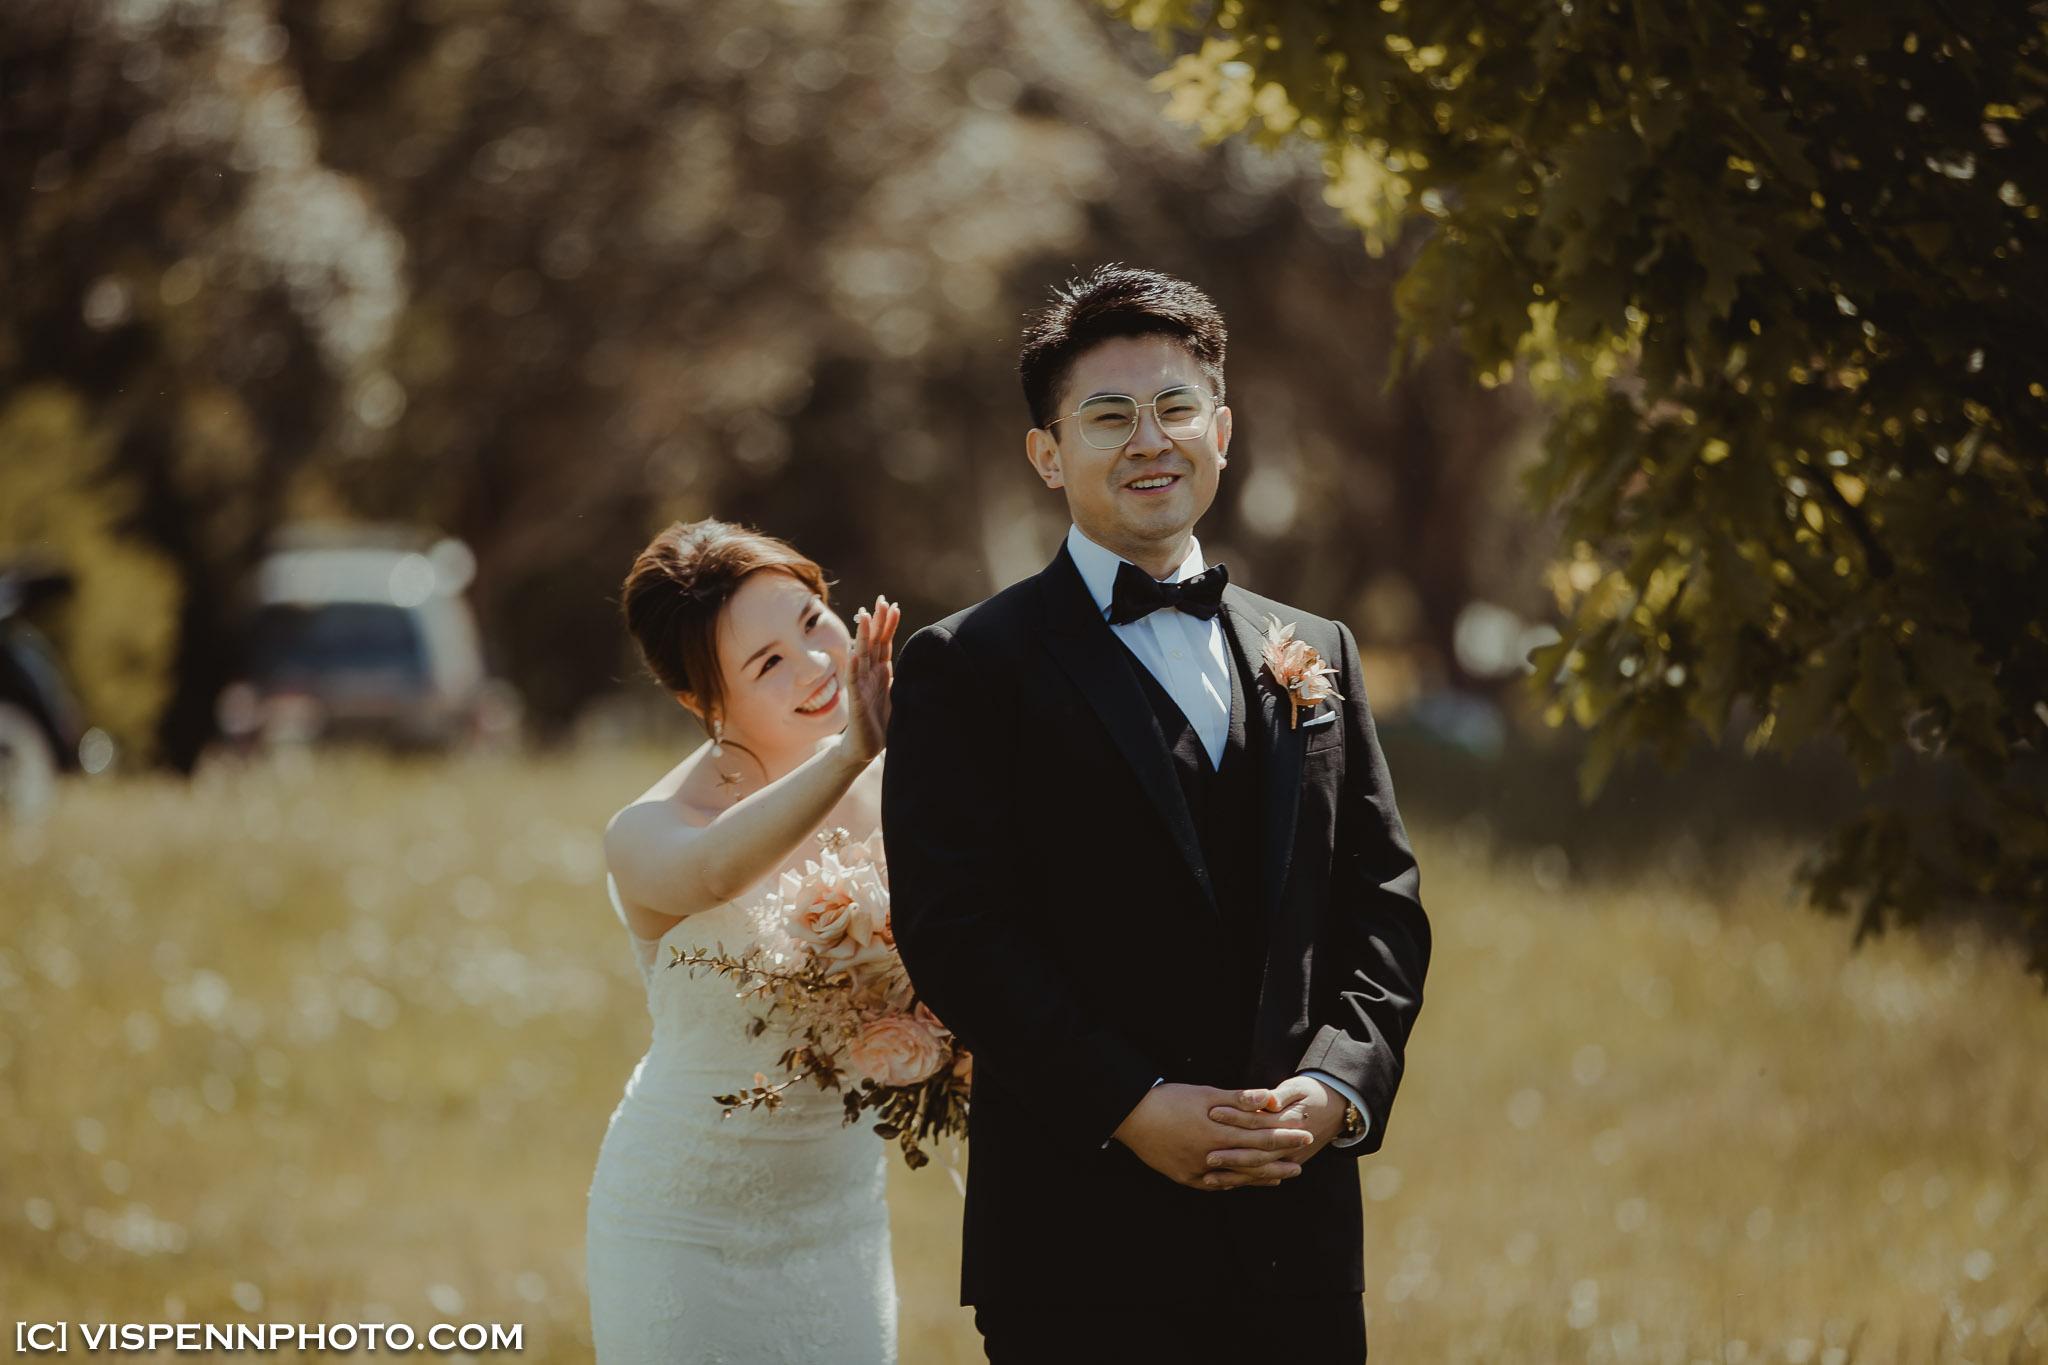 WEDDING DAY Photography Melbourne ElitaPB 05429 2P 1DX2 ZHPENN